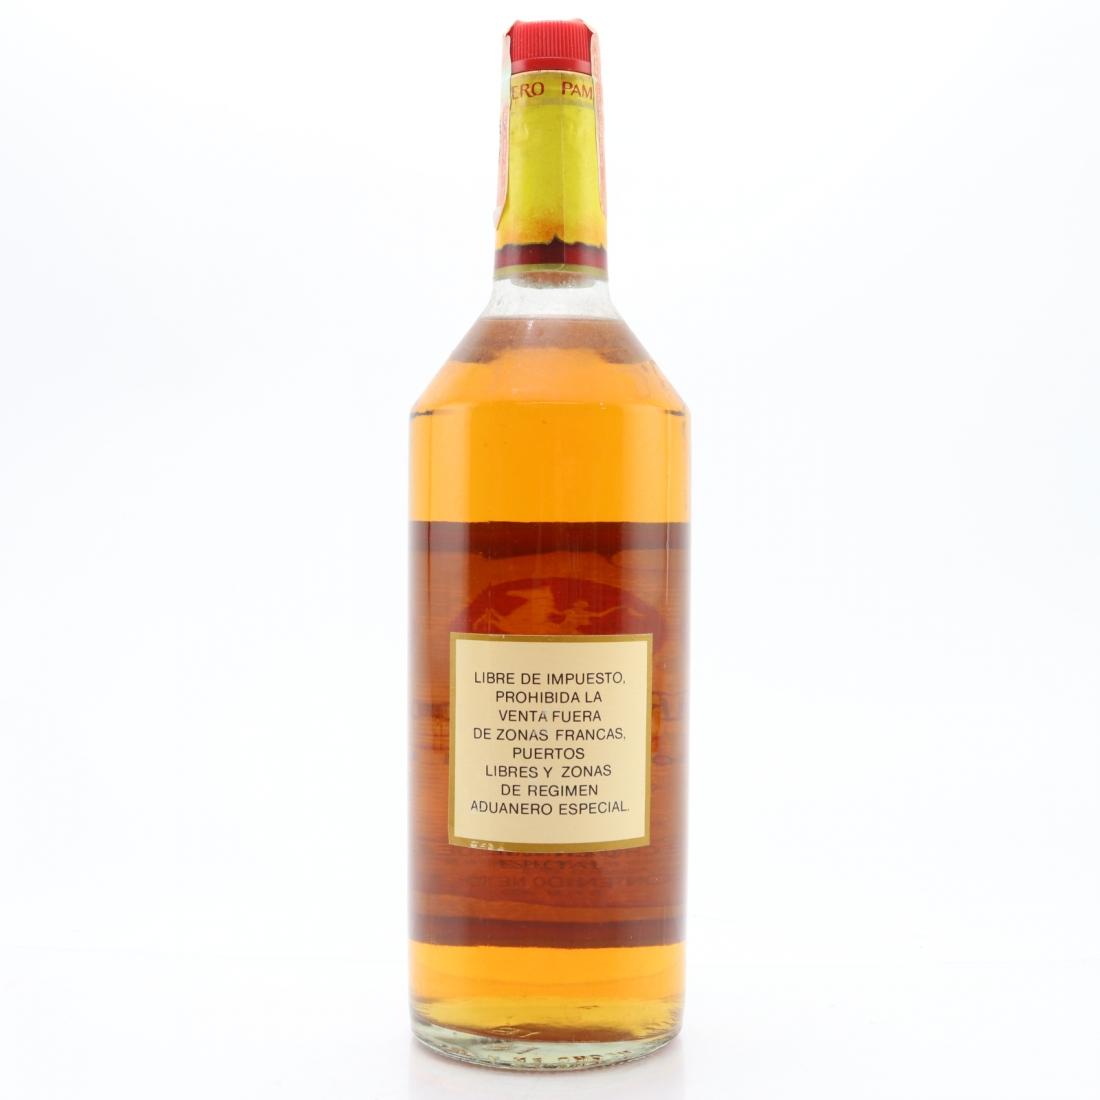 Pampero Rum Anejo Especial 1 Litre